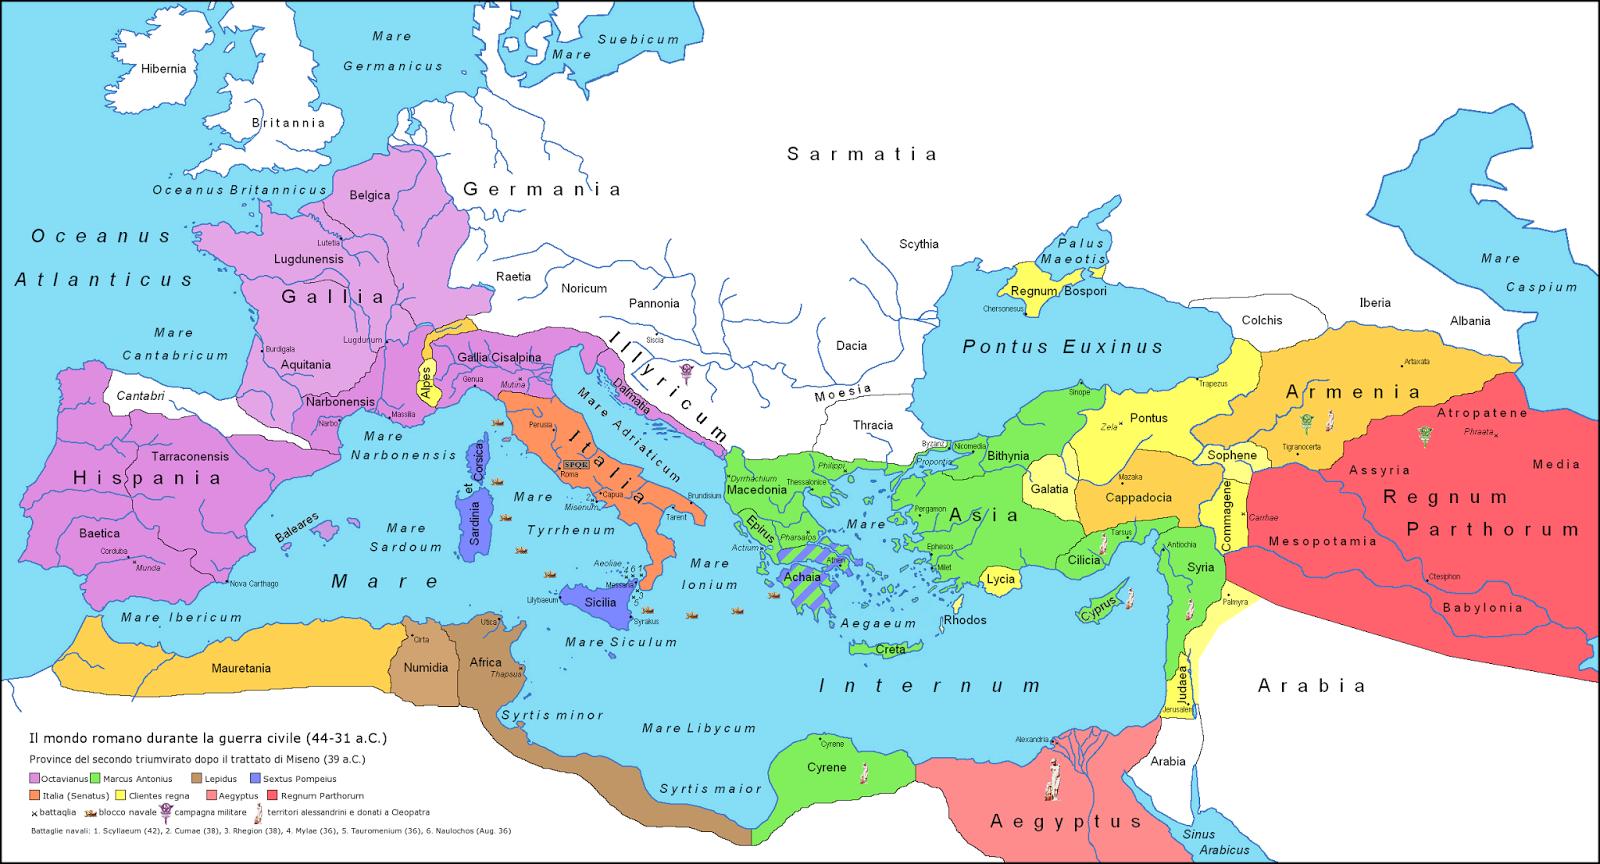 impero+romano